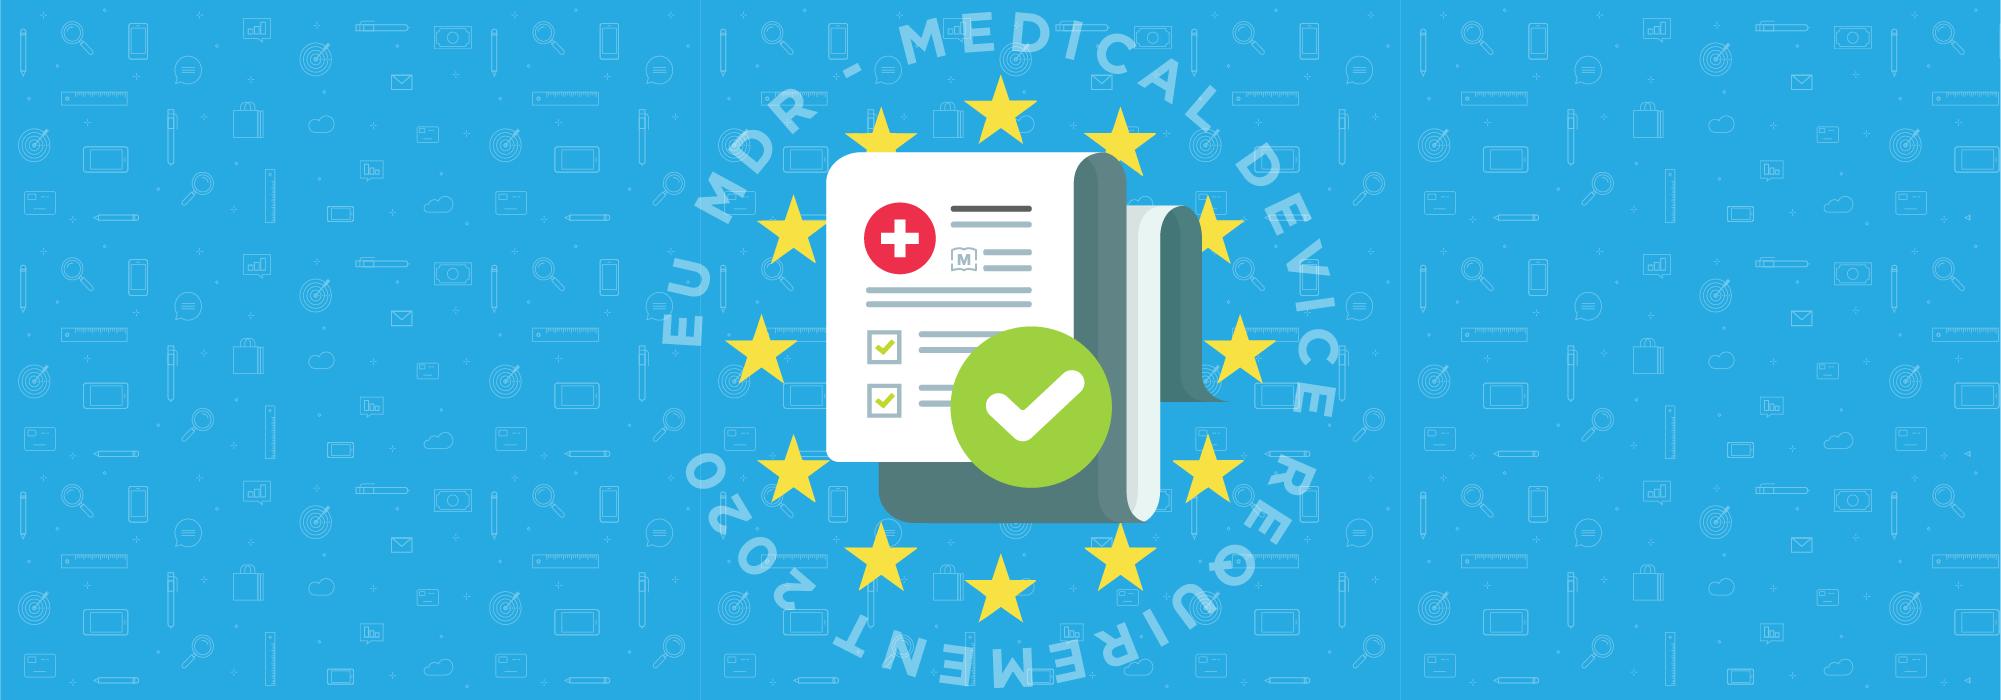 eu medical device requirement